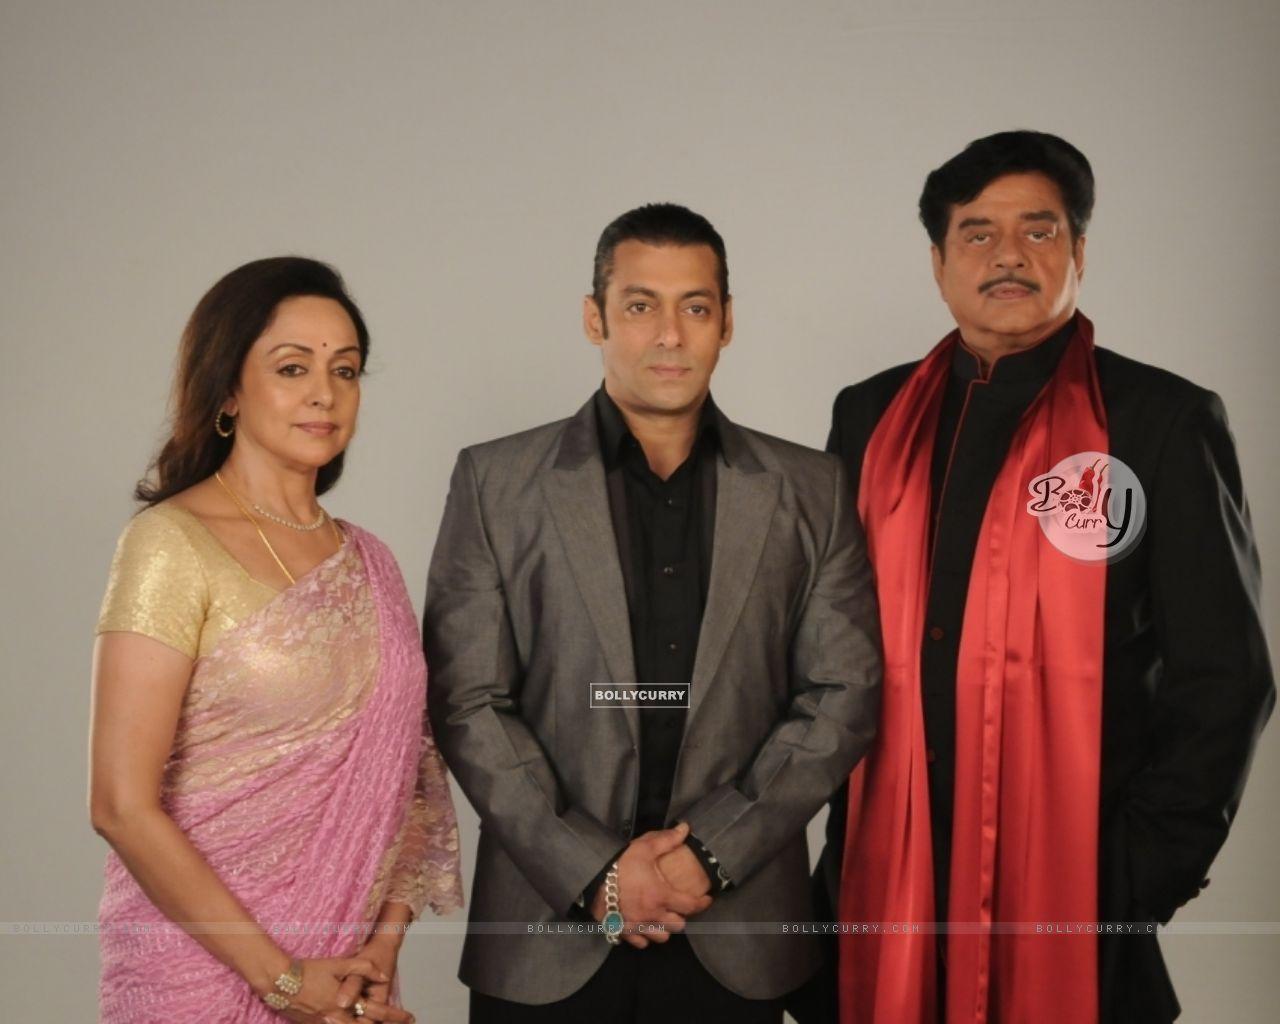 Salman Khan with Hema Malini and Shatrughan Sinha (38558) size:1280x1024